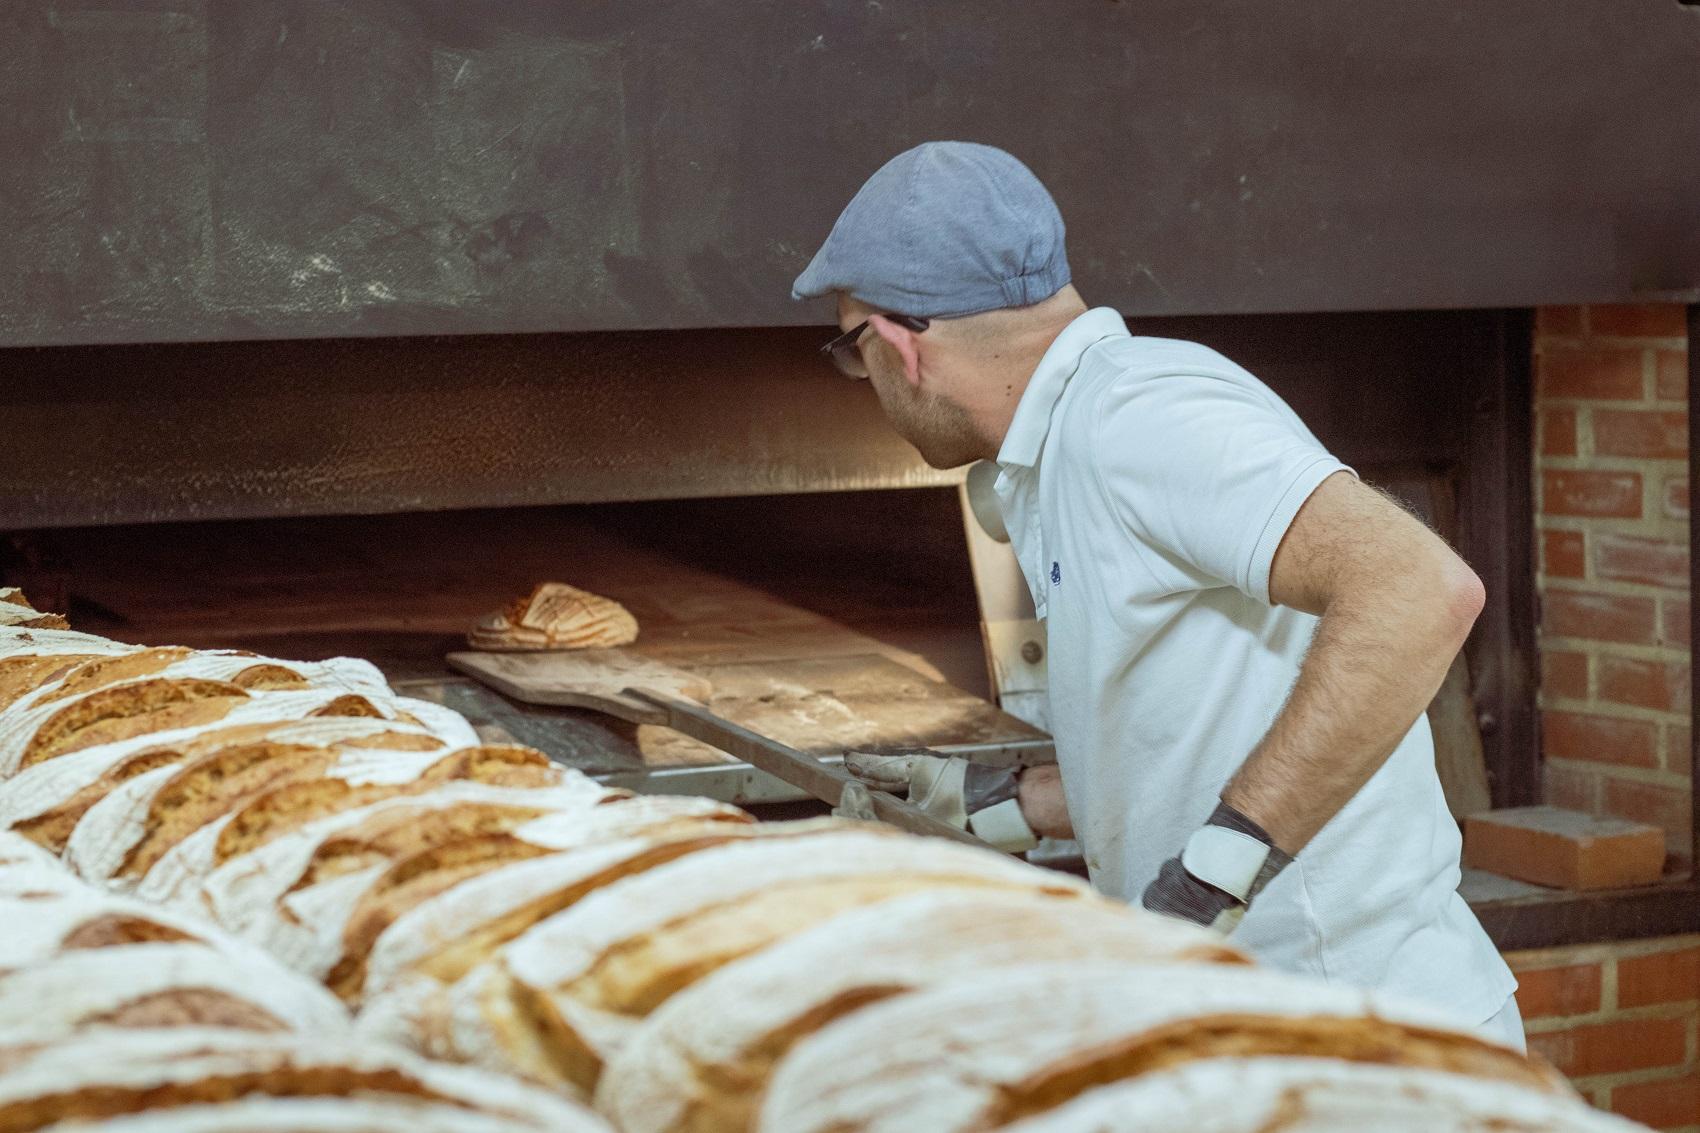 Baker at work. Photo by DDP at Unsplash.com